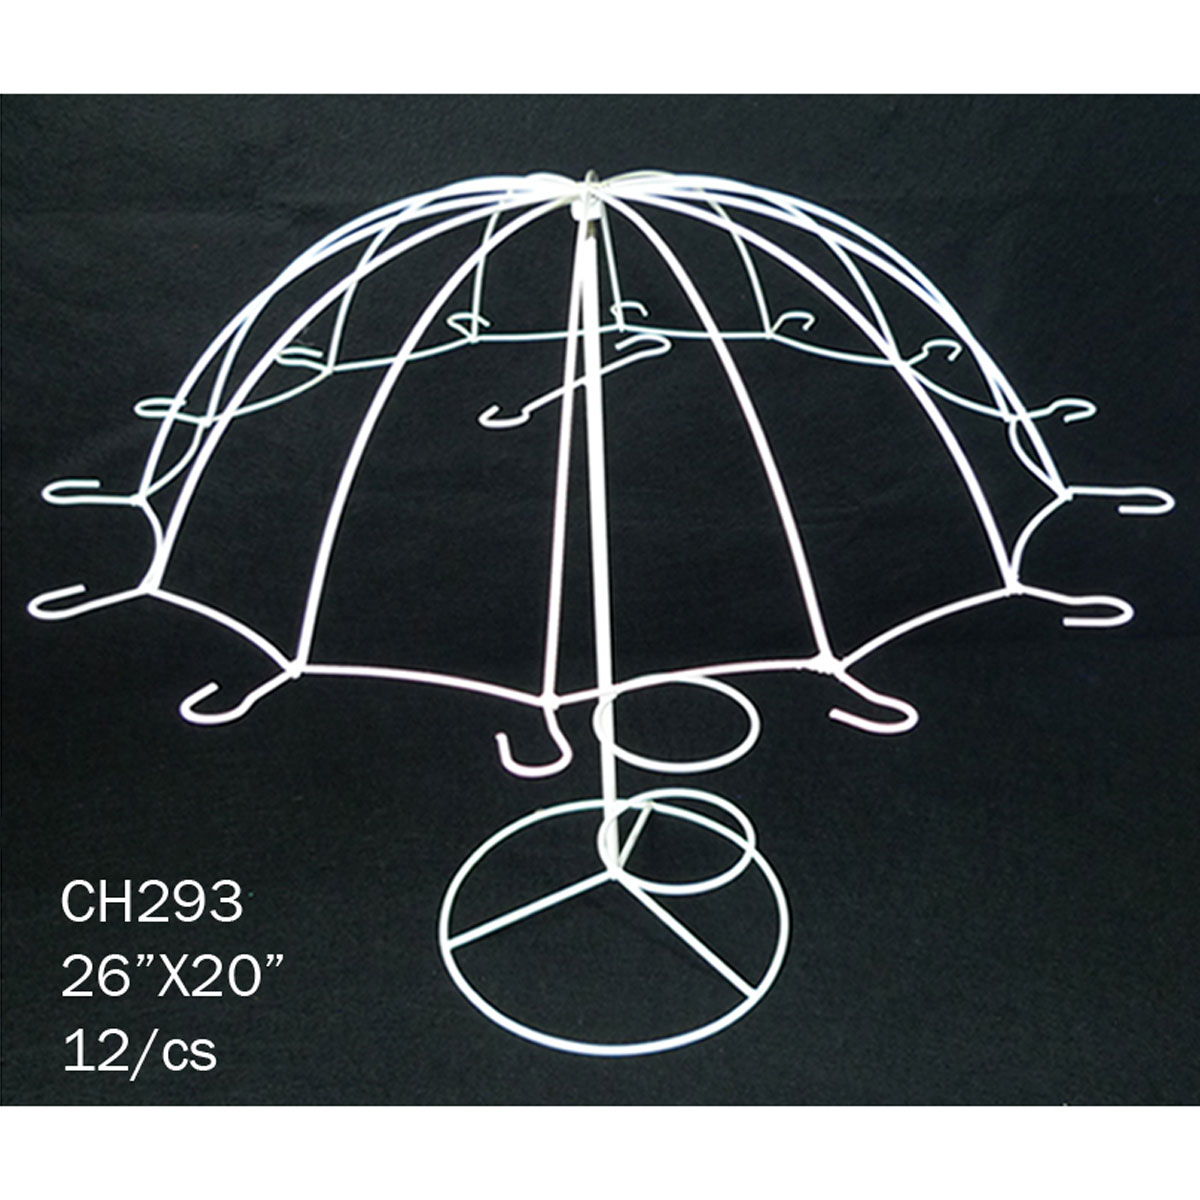 baby baptism photo ideas - ifavor123 Umbrella Party Centerpiece White Wire $60 00